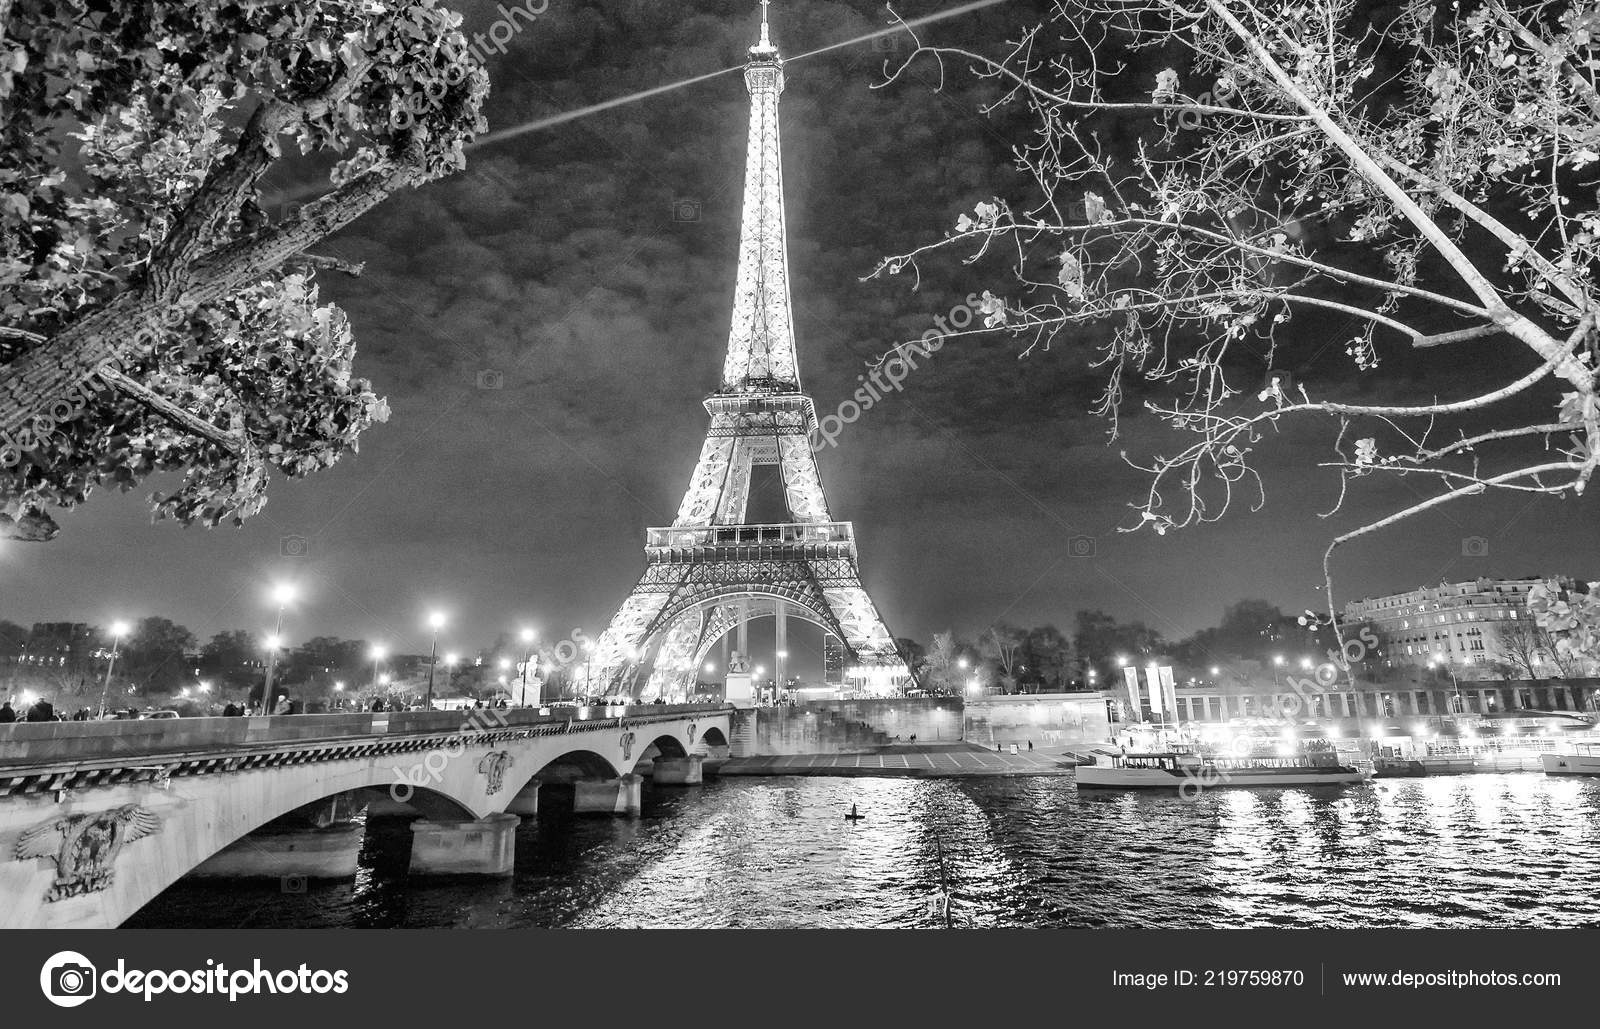 Paris France December 2012 Lights Eiffel Tower Night City Attracts